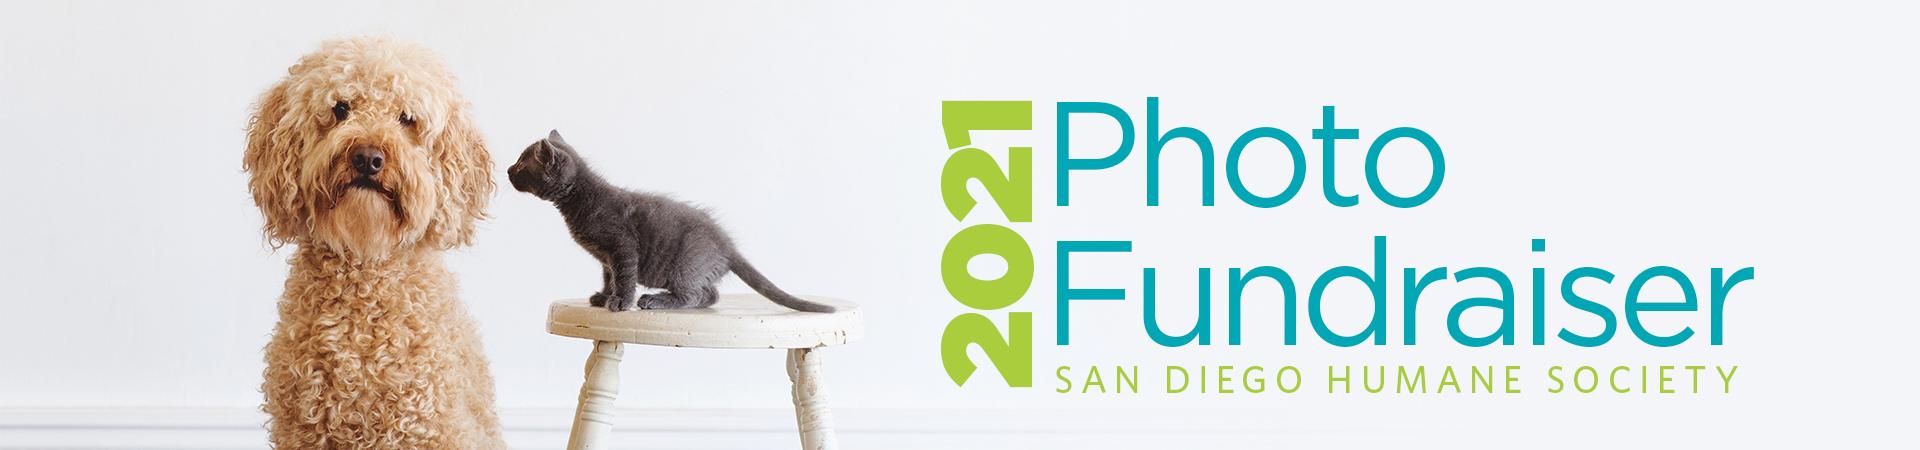 2021 Photo Fundraiser Banner